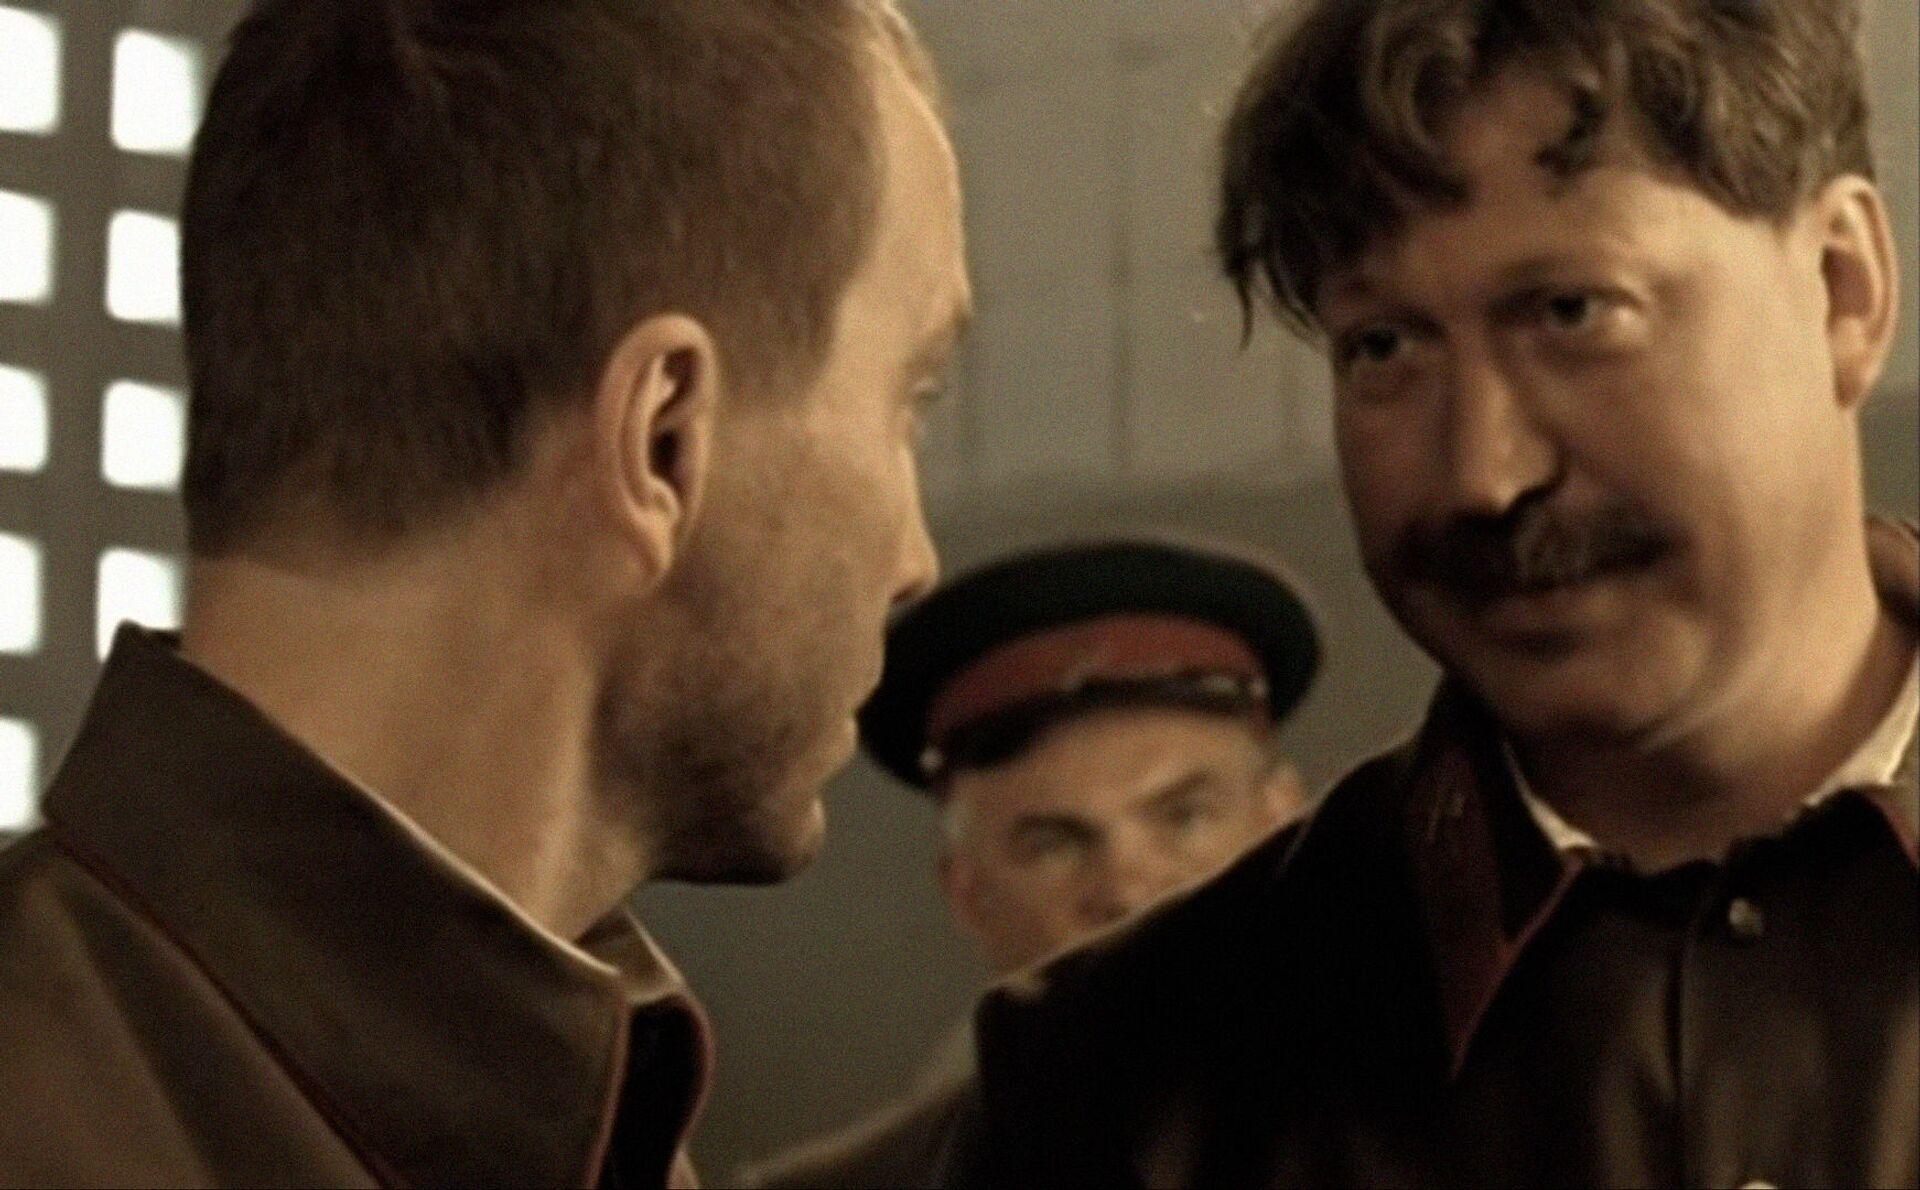 Умер актер, сценарист и каскадер Виктор Павлюченков - Sputnik Беларусь, 1920, 02.02.2021